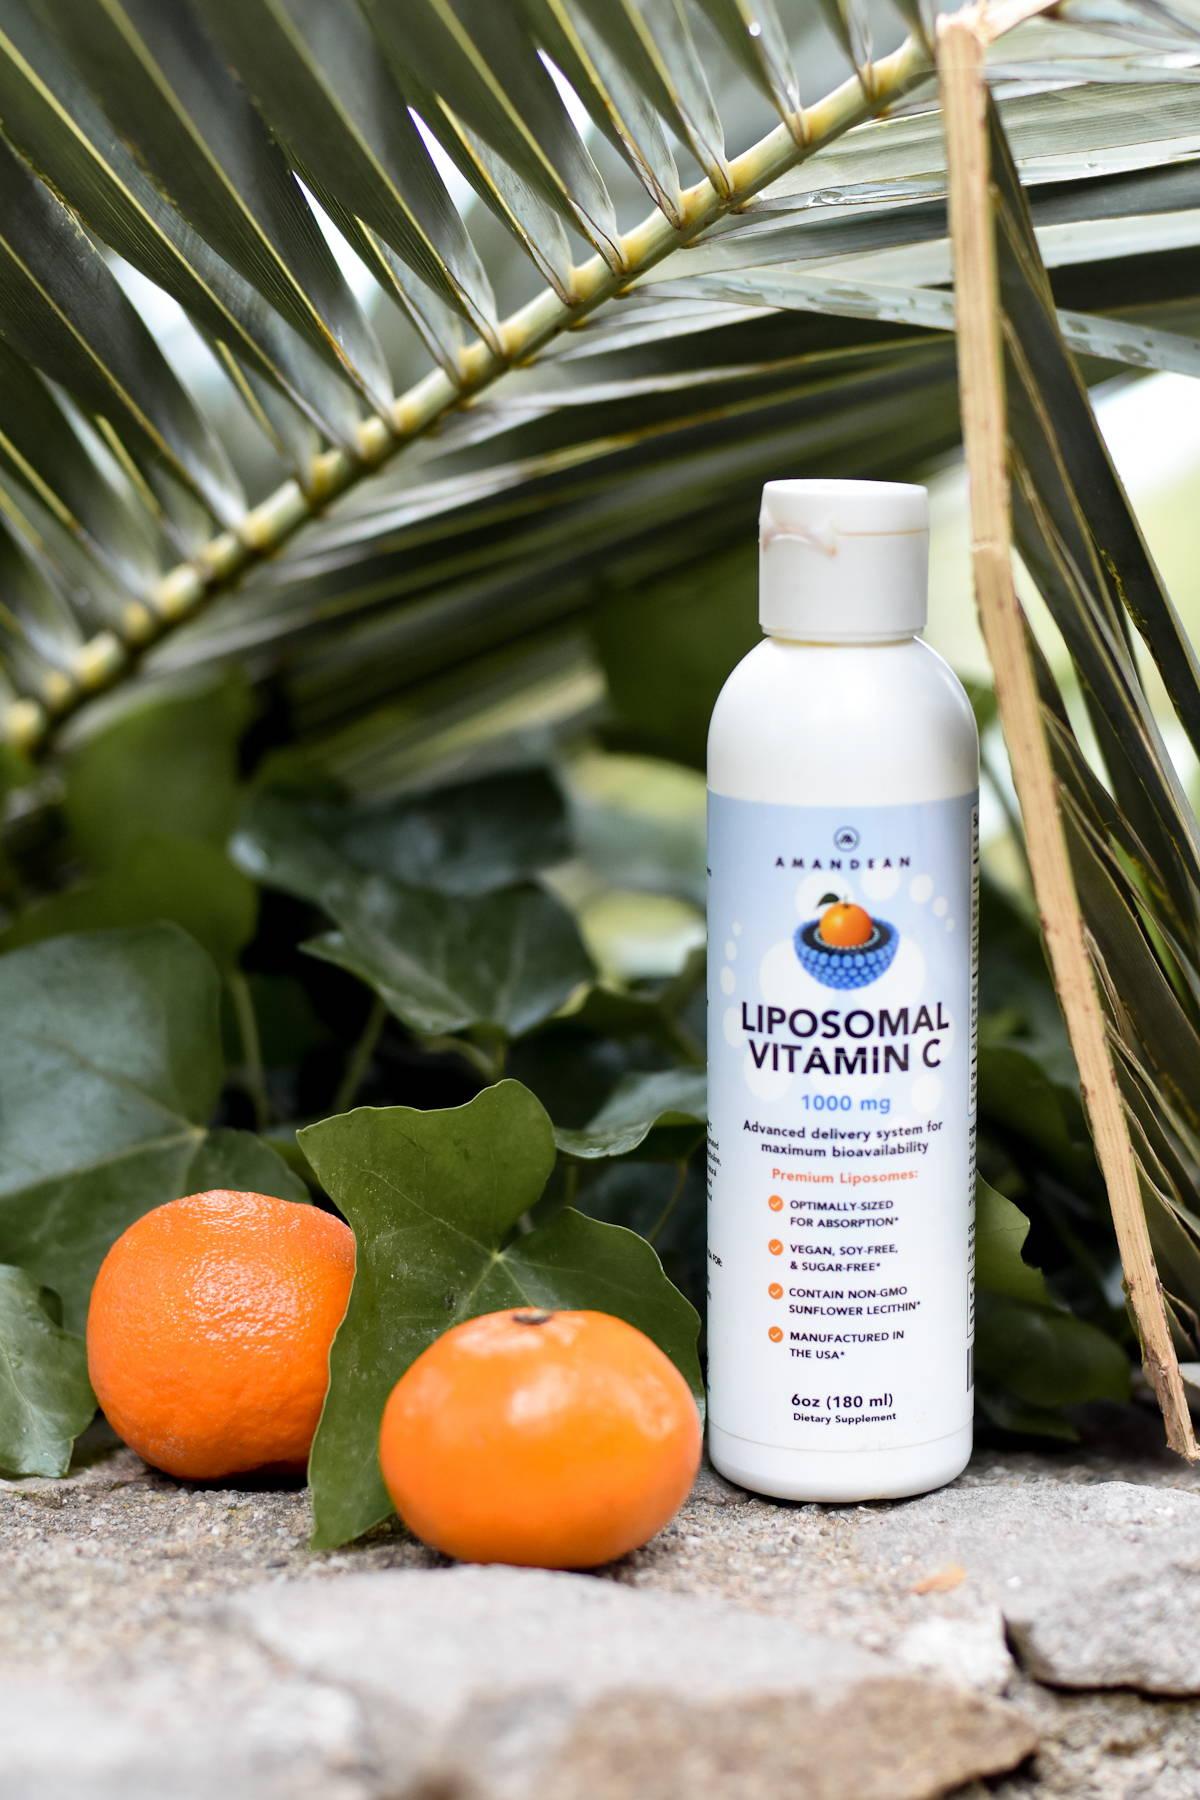 Amandean Liposomal Vitamin C